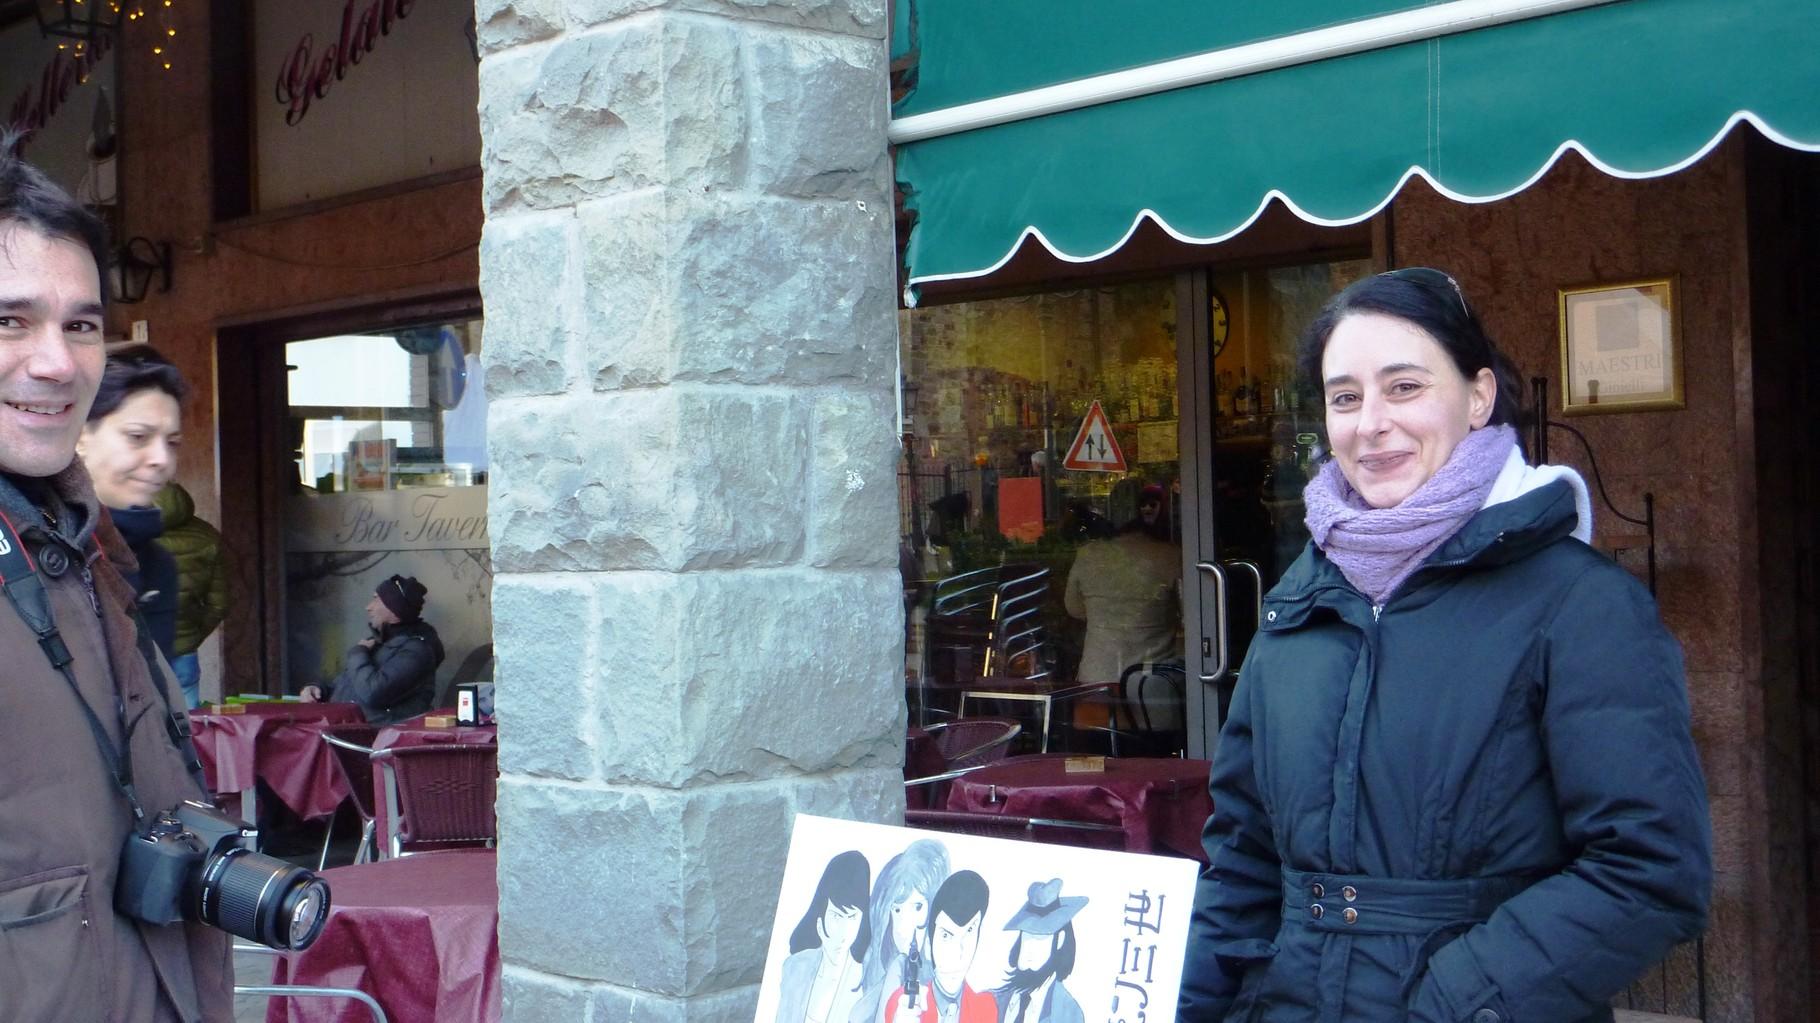 Barbara Carminati